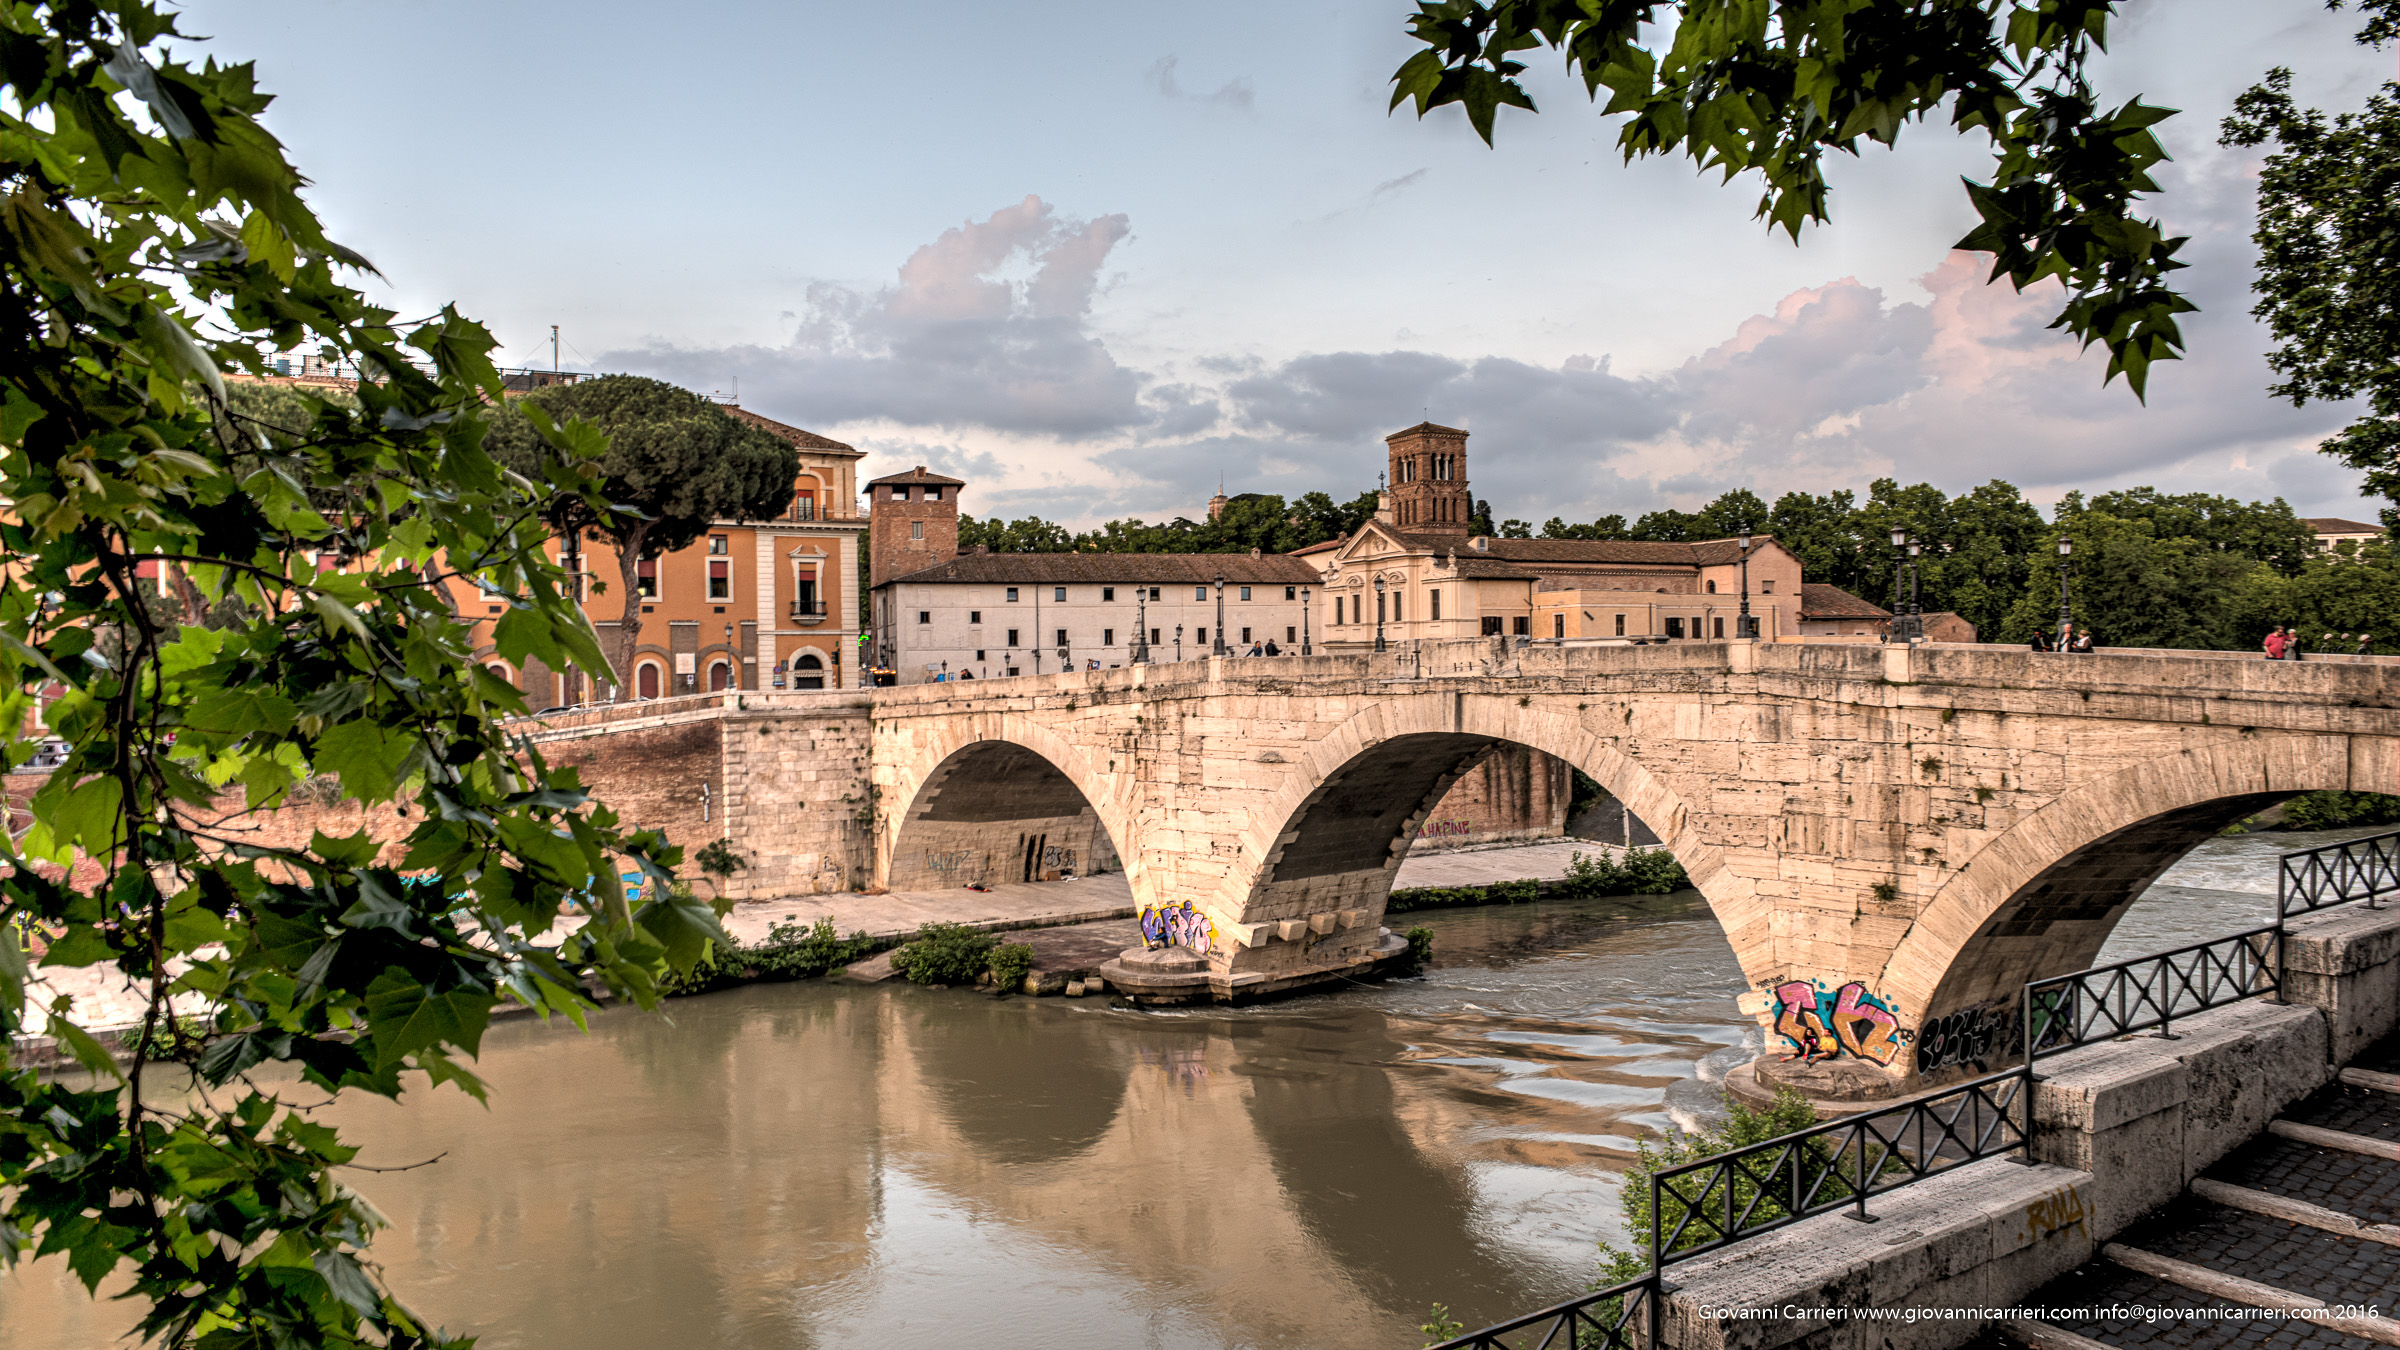 L'isola Tiberina ed il Ponte Cestio, Roma